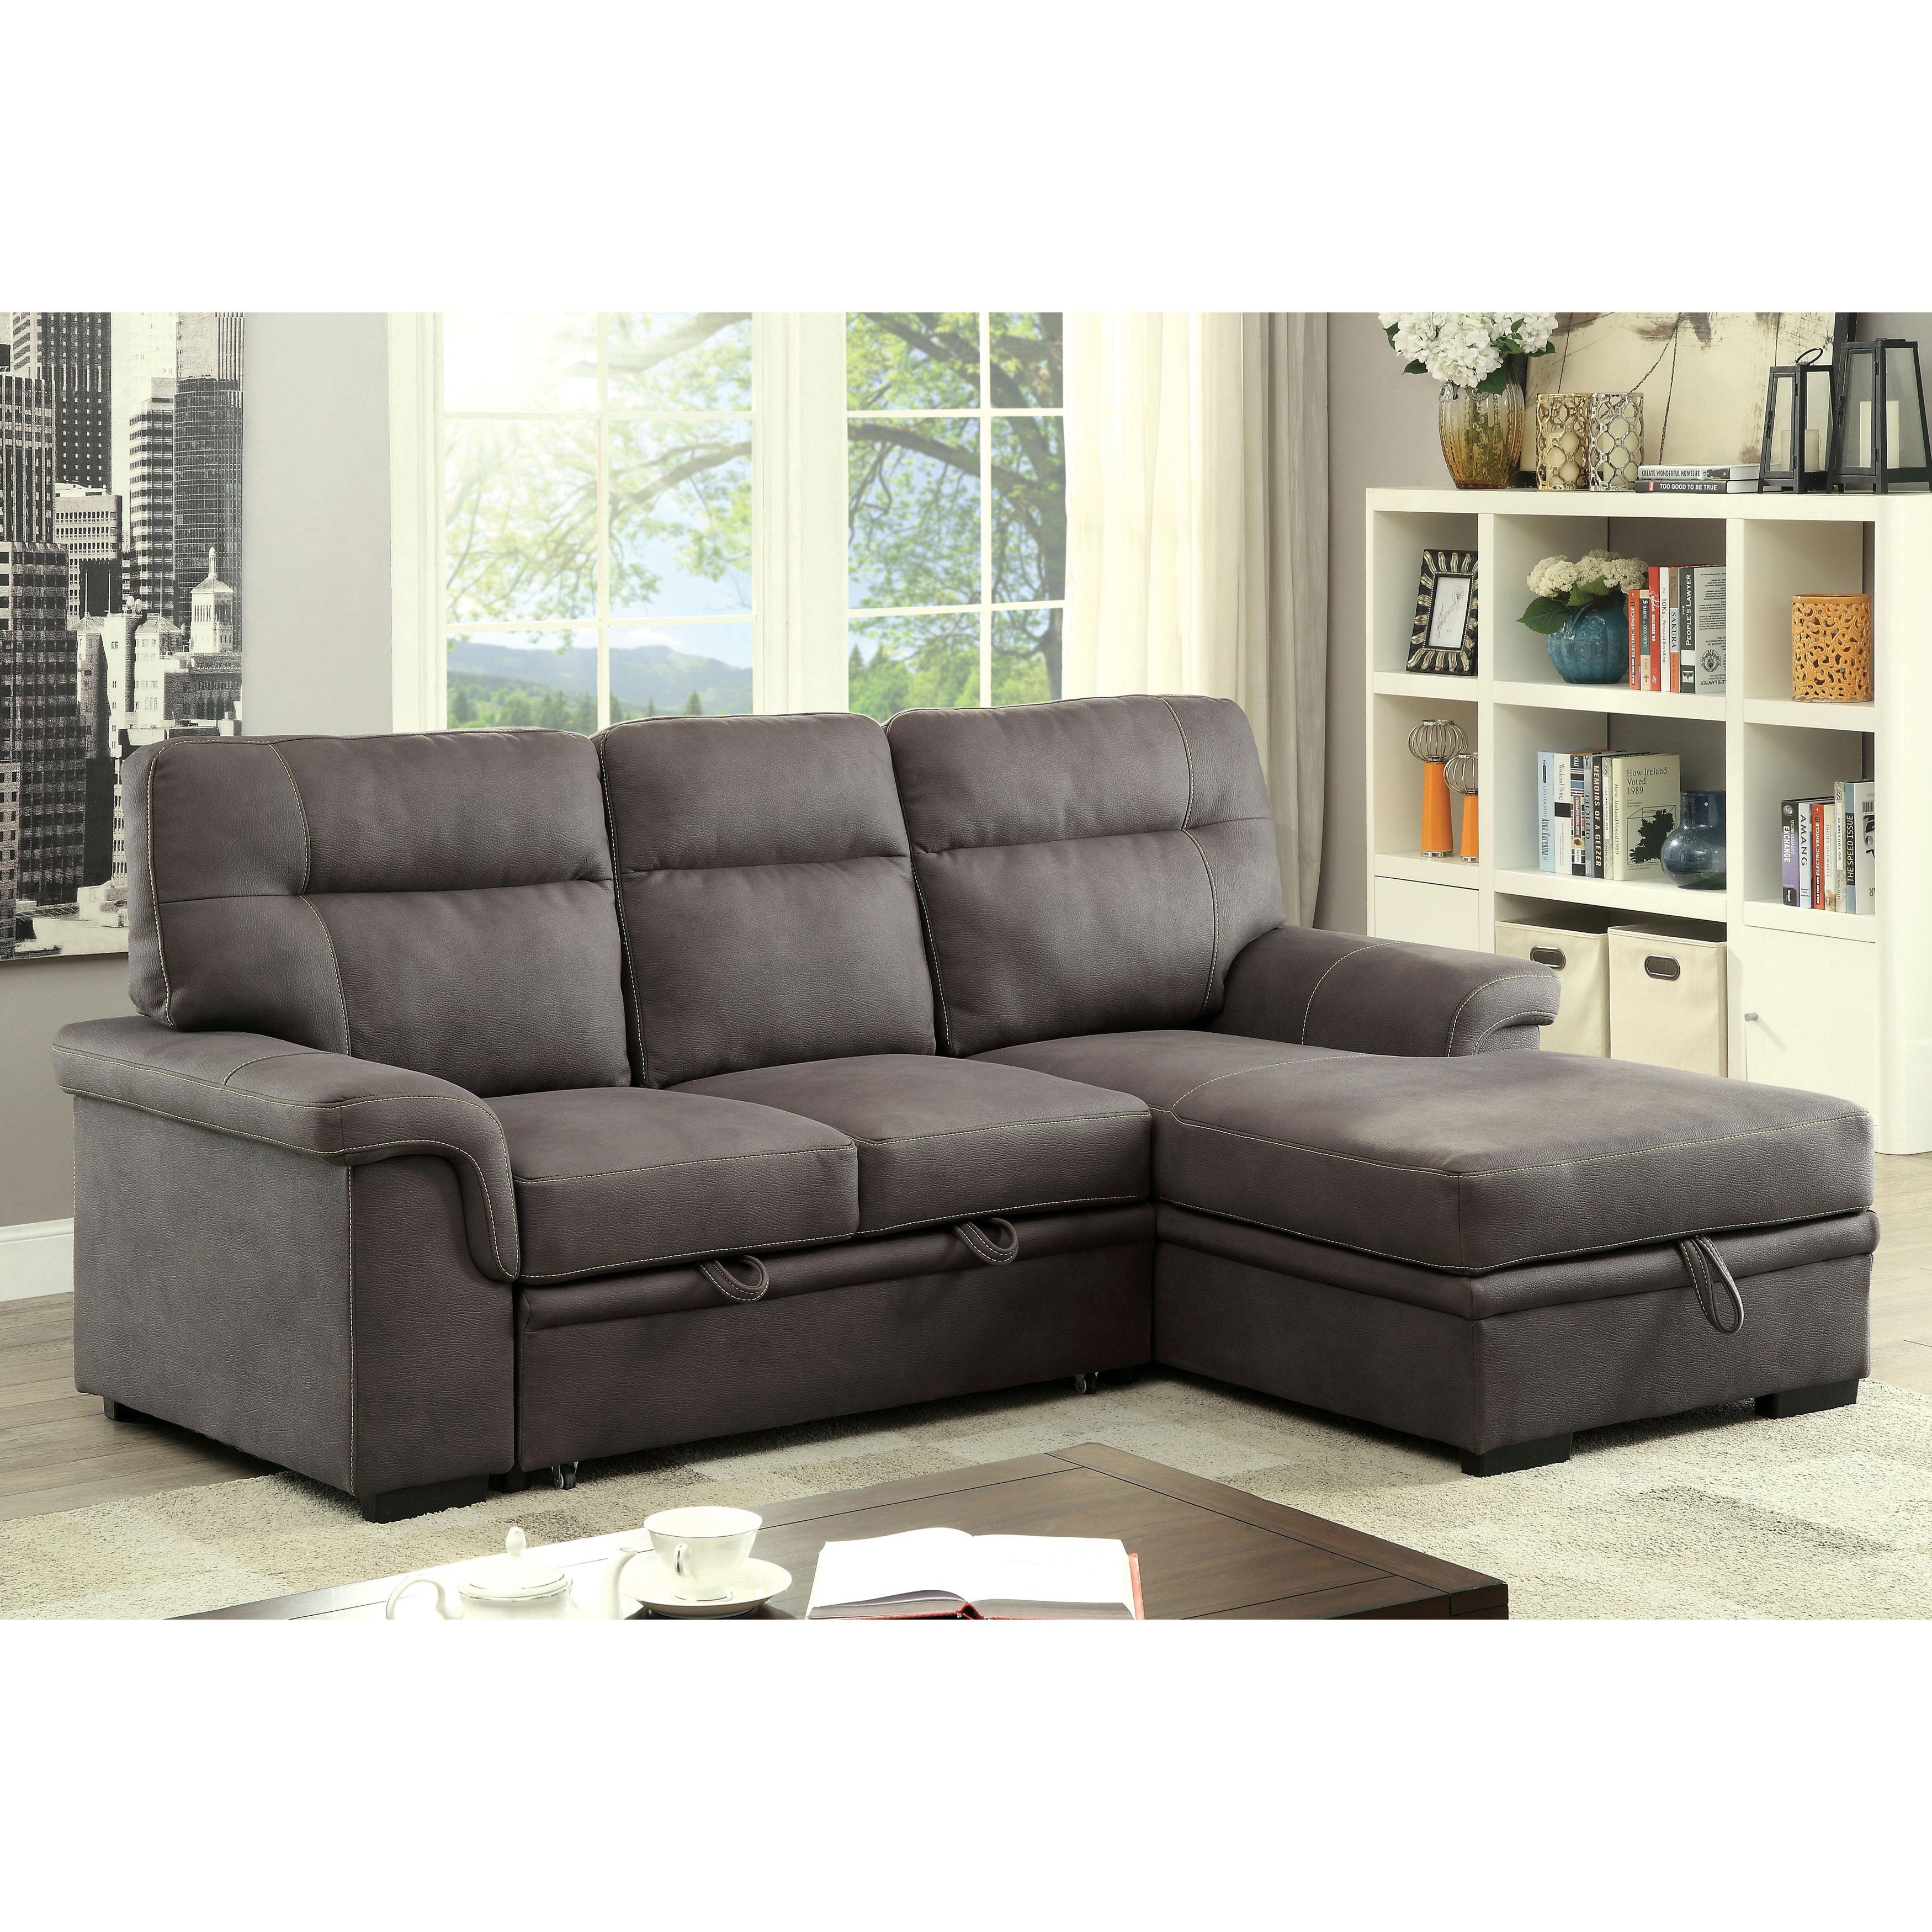 Furniture of America Samera Transitional Graphite Convert...